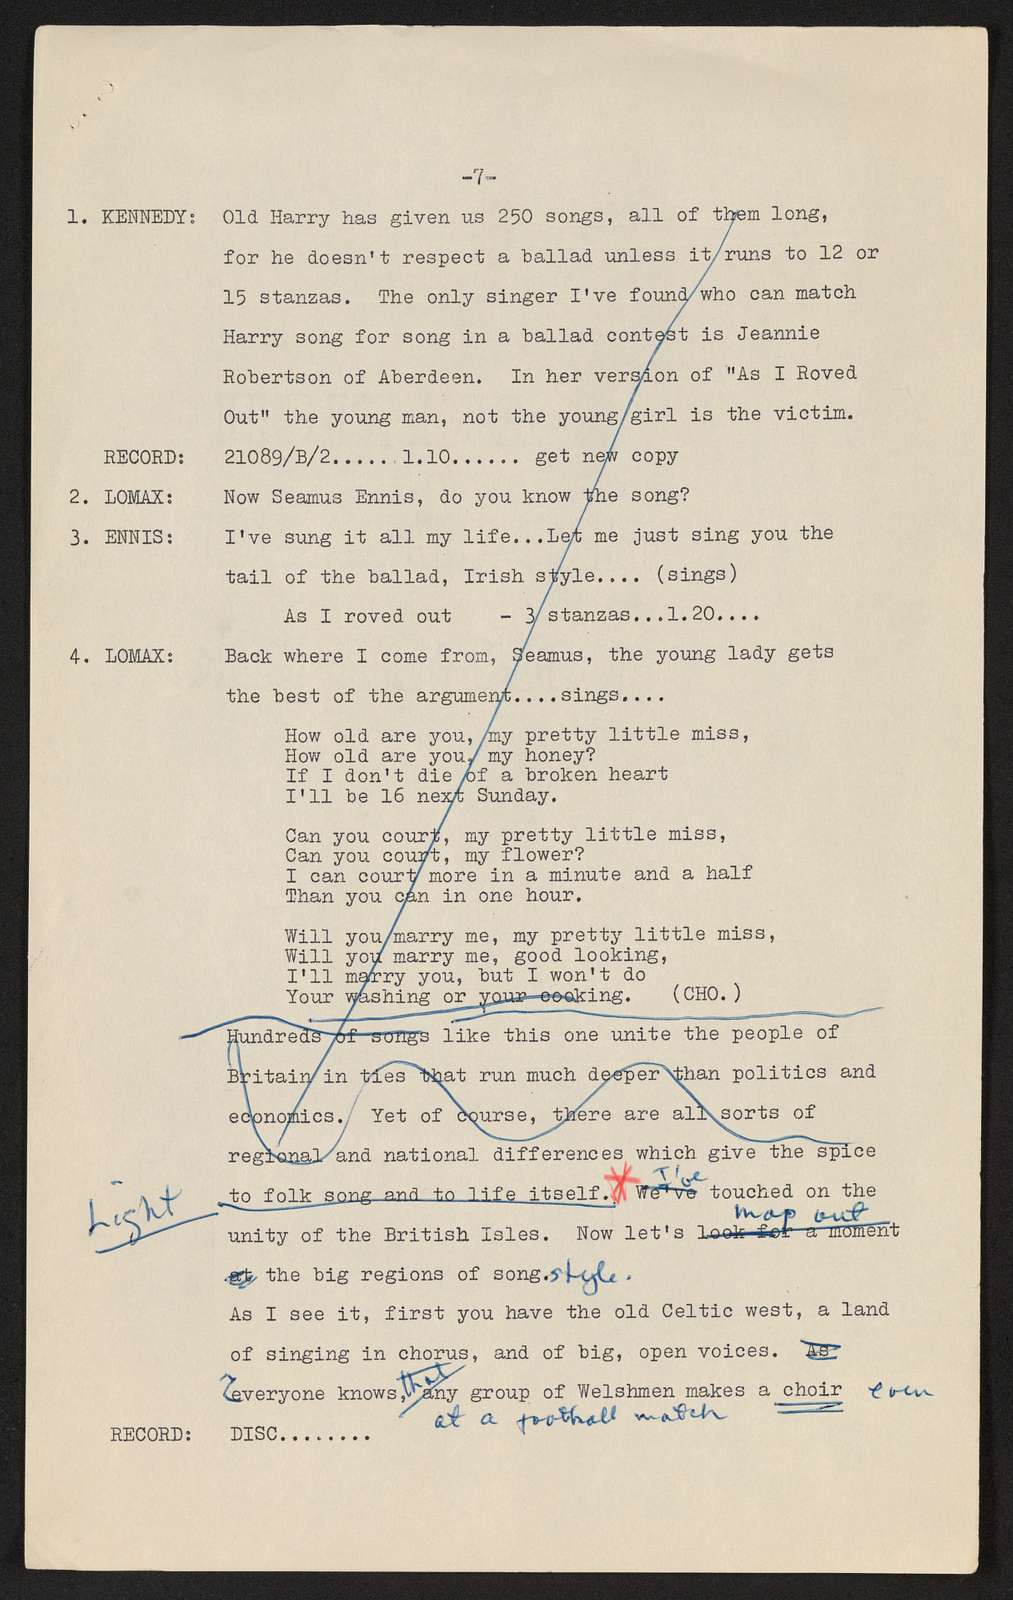 Alan Lomax Collection, Manuscripts, BBC, 1957, A Ballad Hunter Looks at Britain